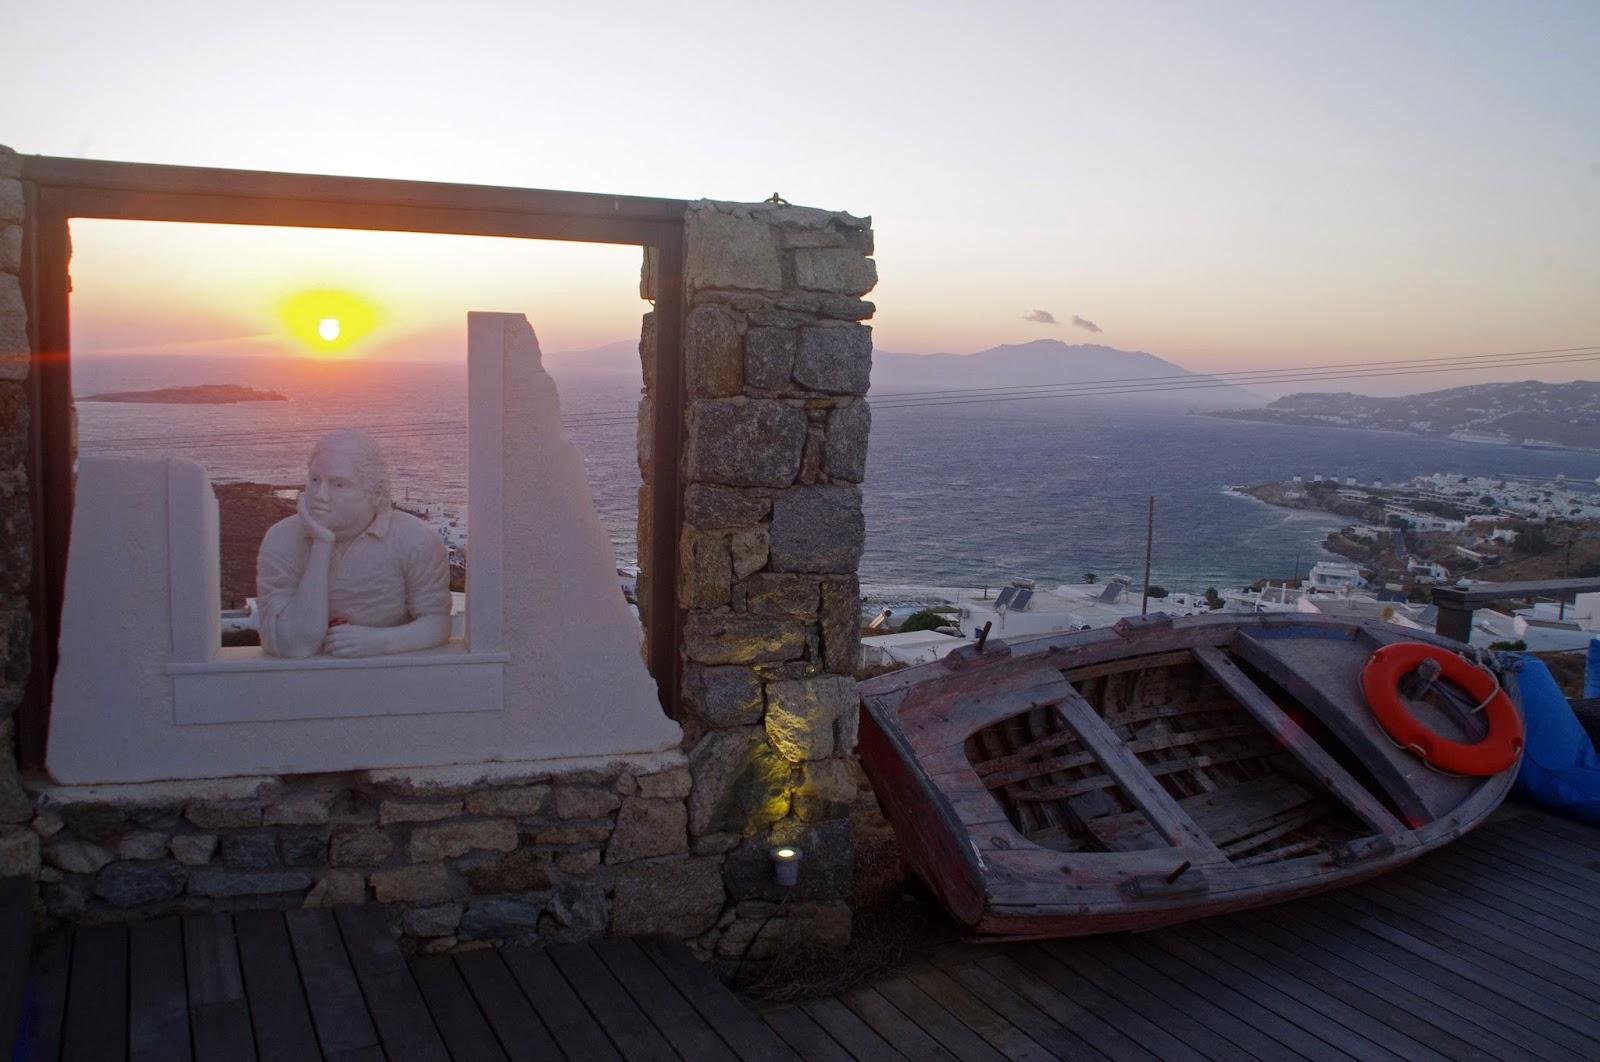 Tharroe of Mykonos Sunset over island